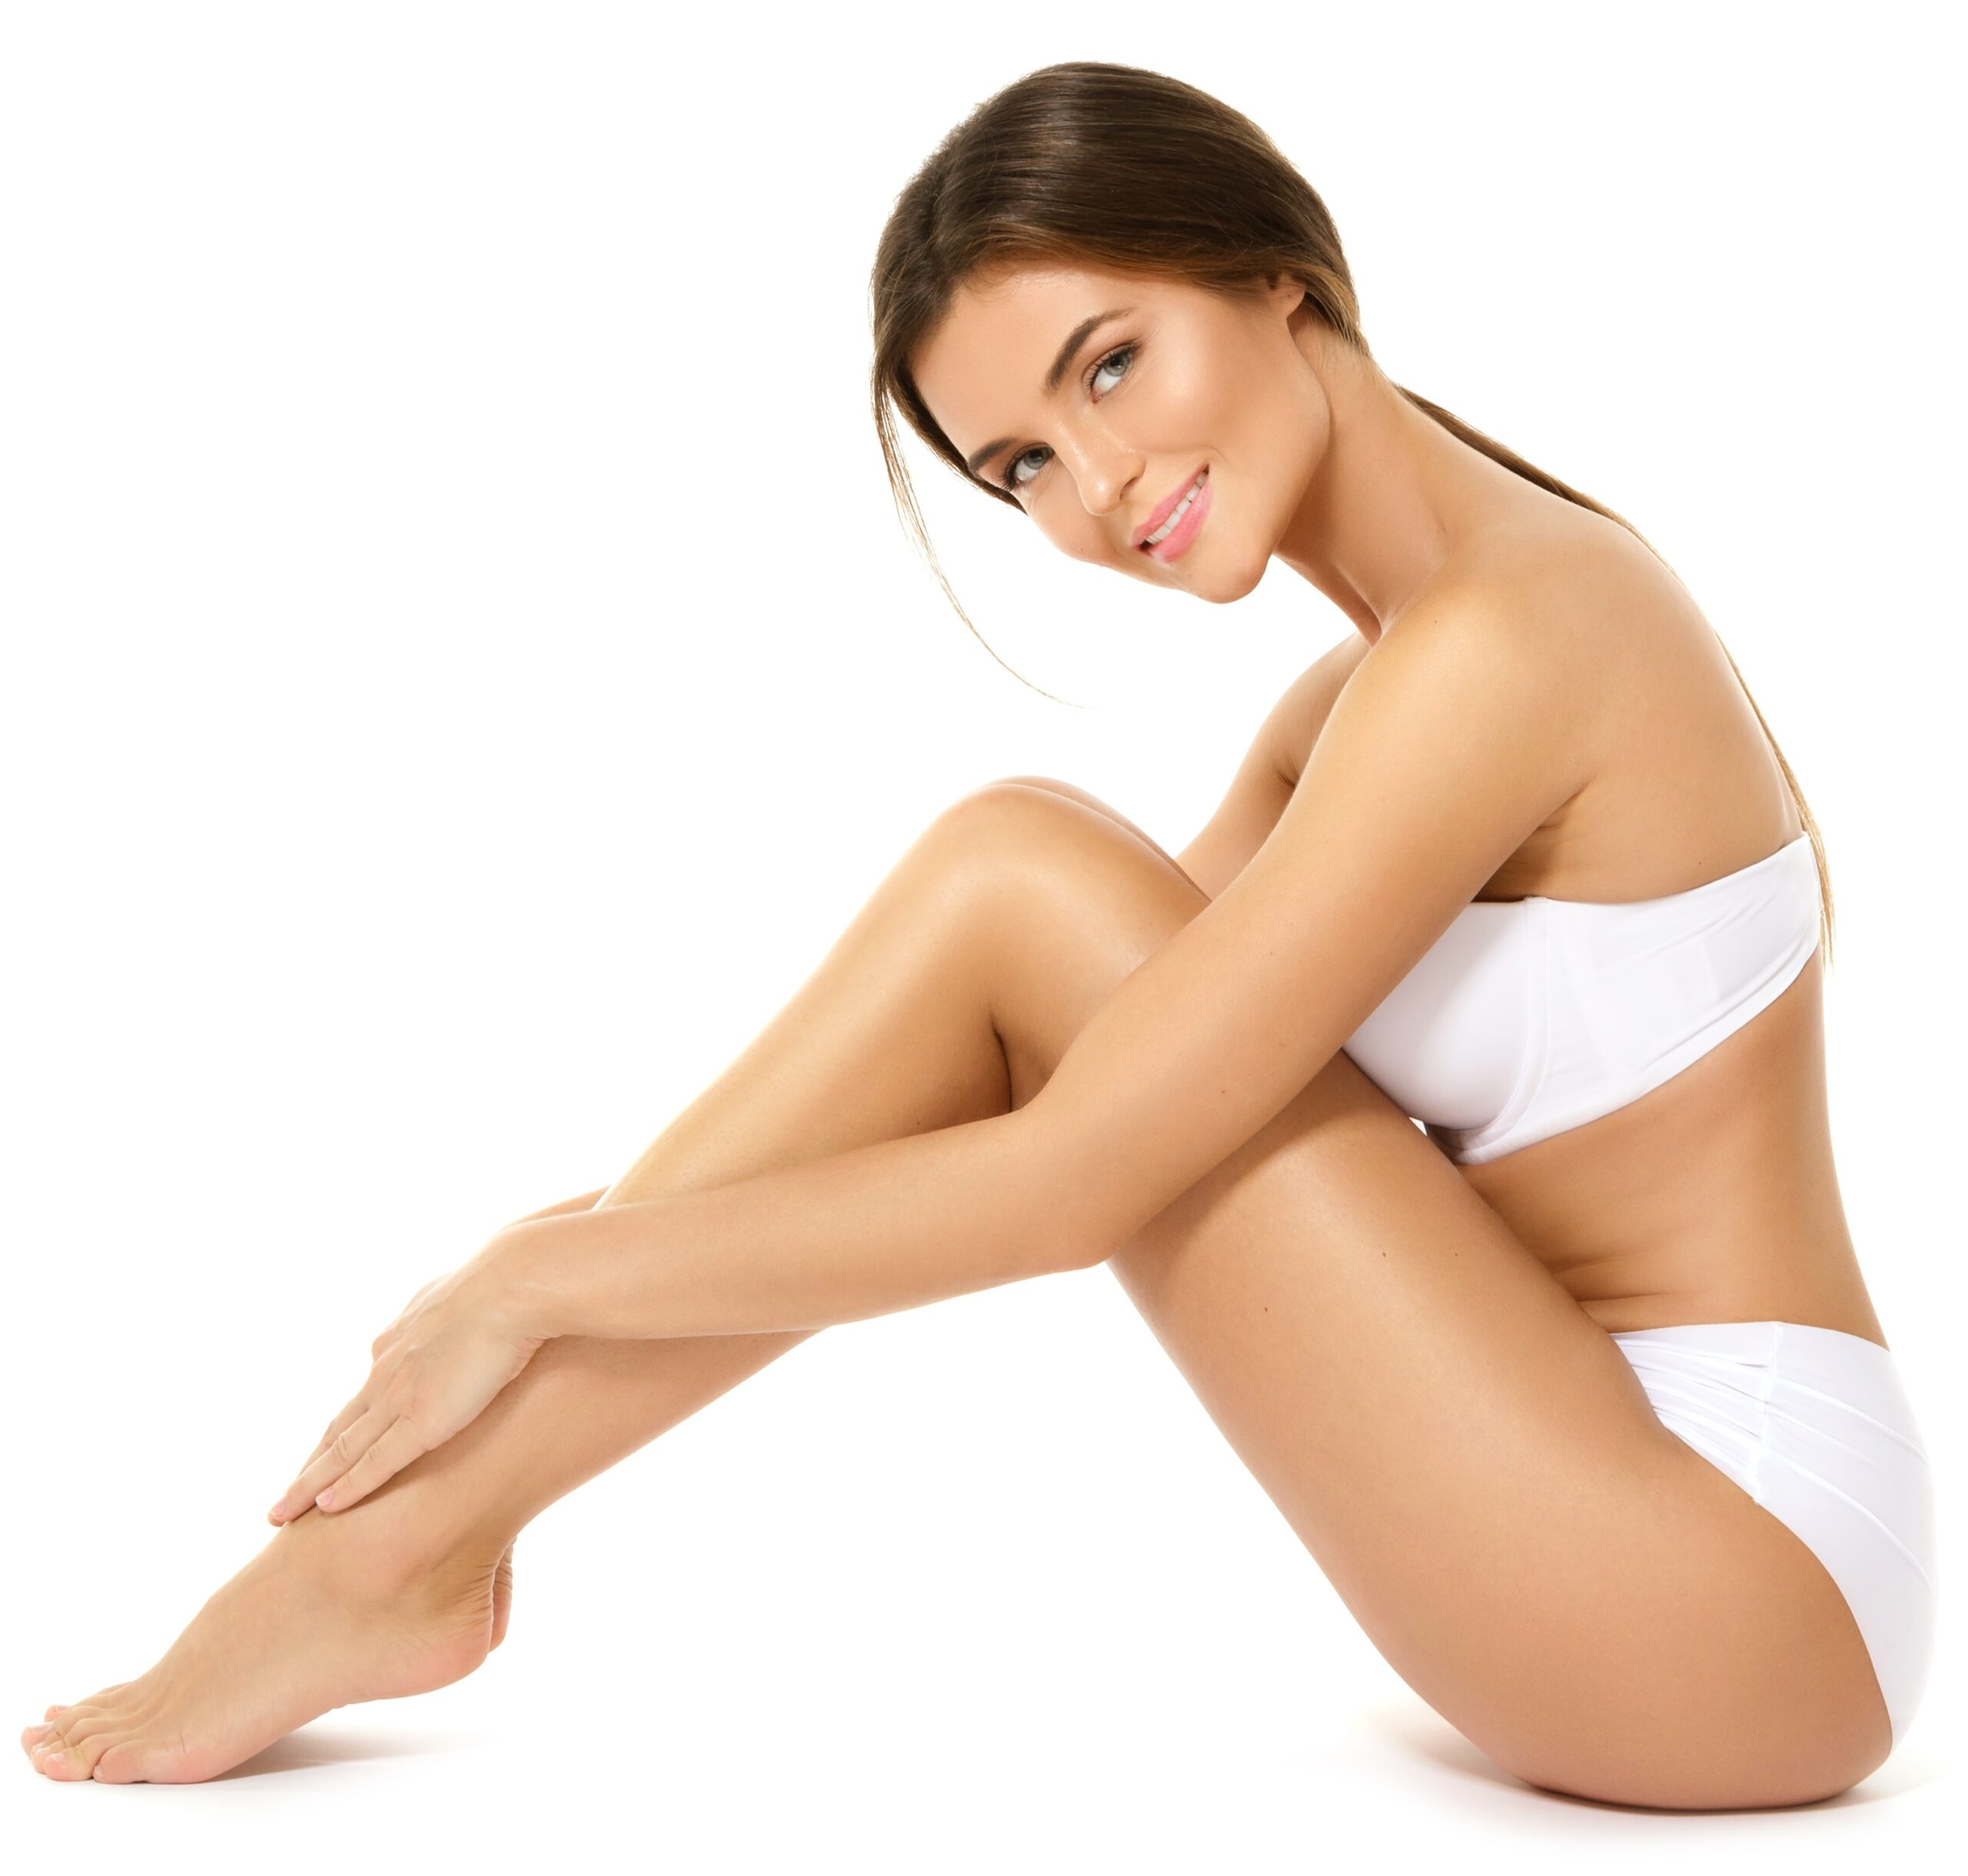 Spring Mist Med Spa's customized Body Treatments